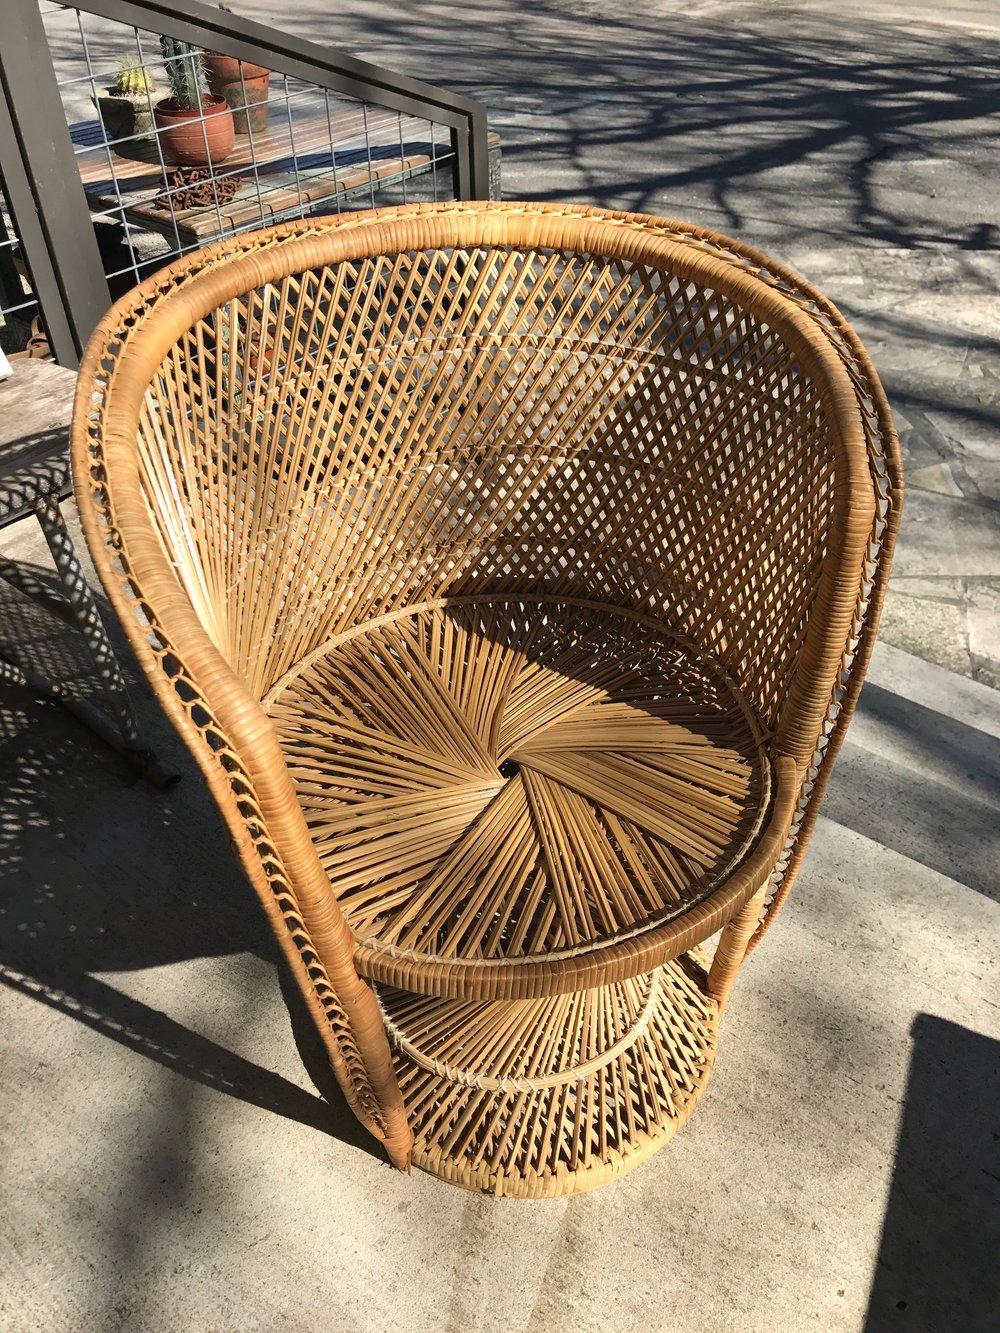 Wicker Chair No.1